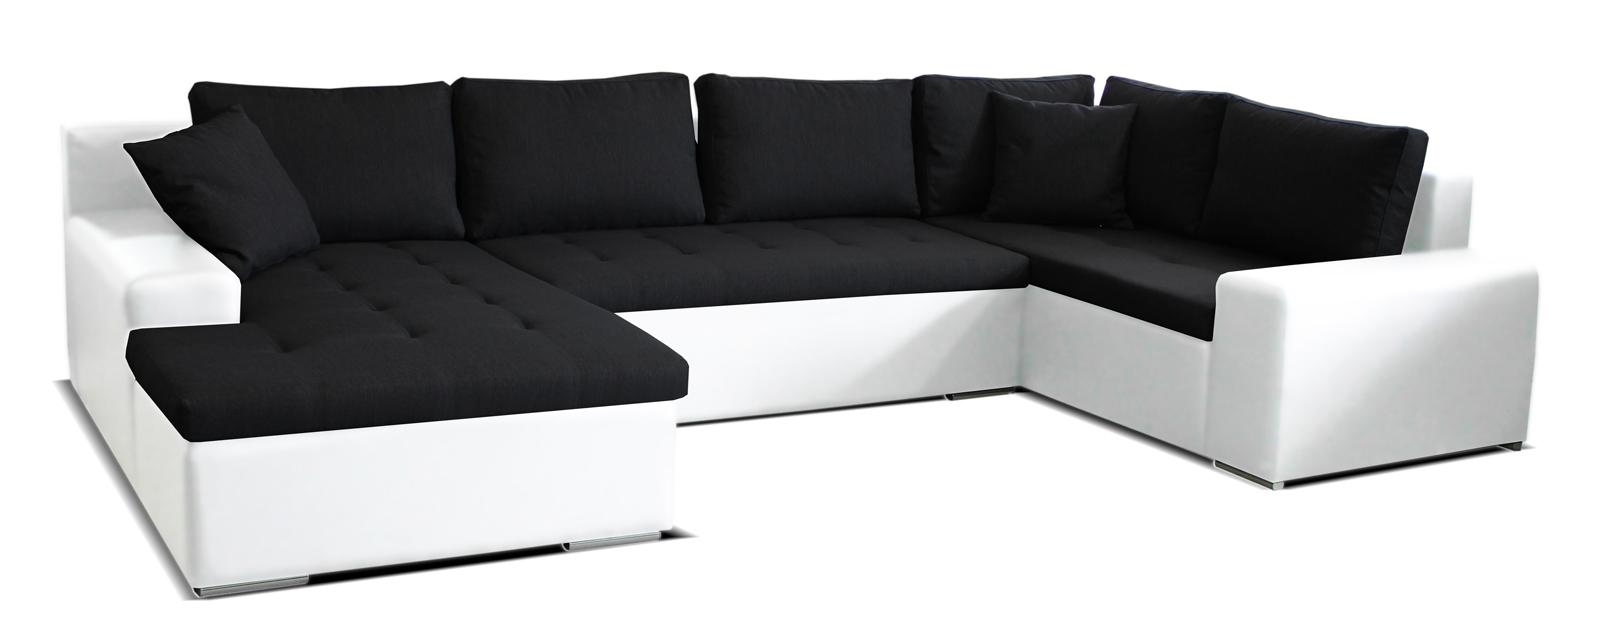 Rohová sedací souprava U - Po-Sed - Moreno L+2+BL (černá + bílá) (L)